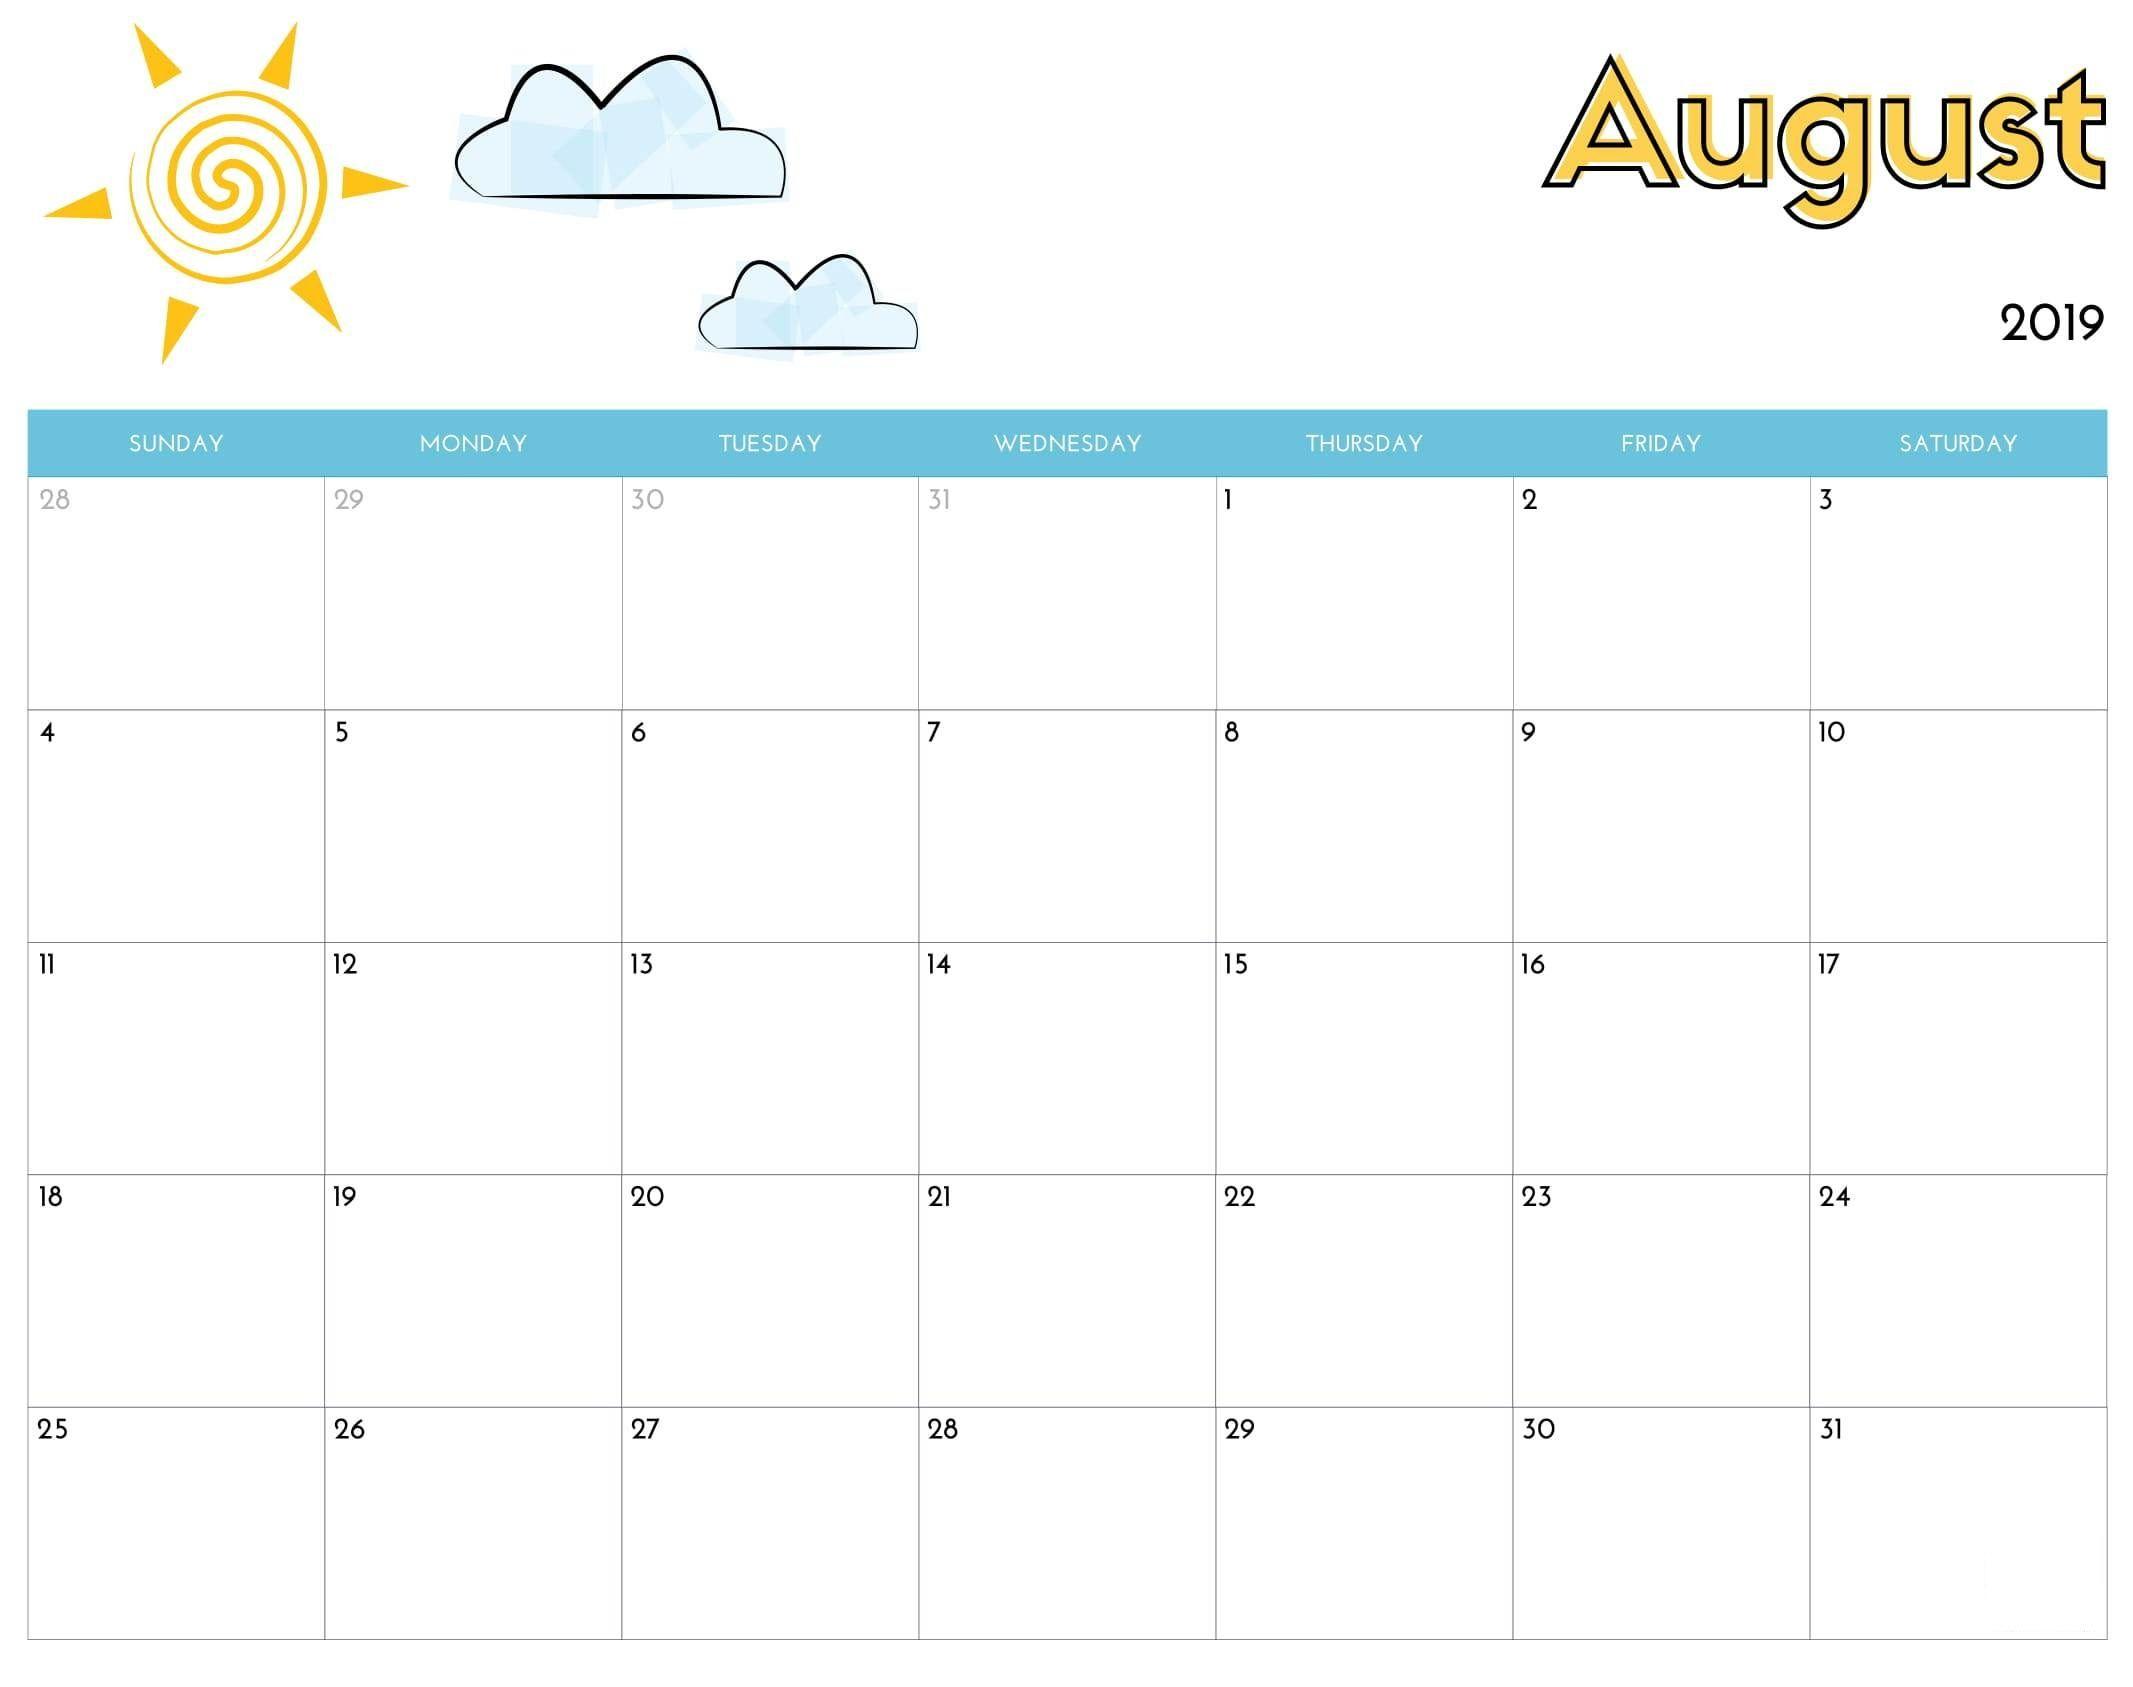 Cute August 2019 Calendar Printable Wallpapers Hd 2019 Calendar